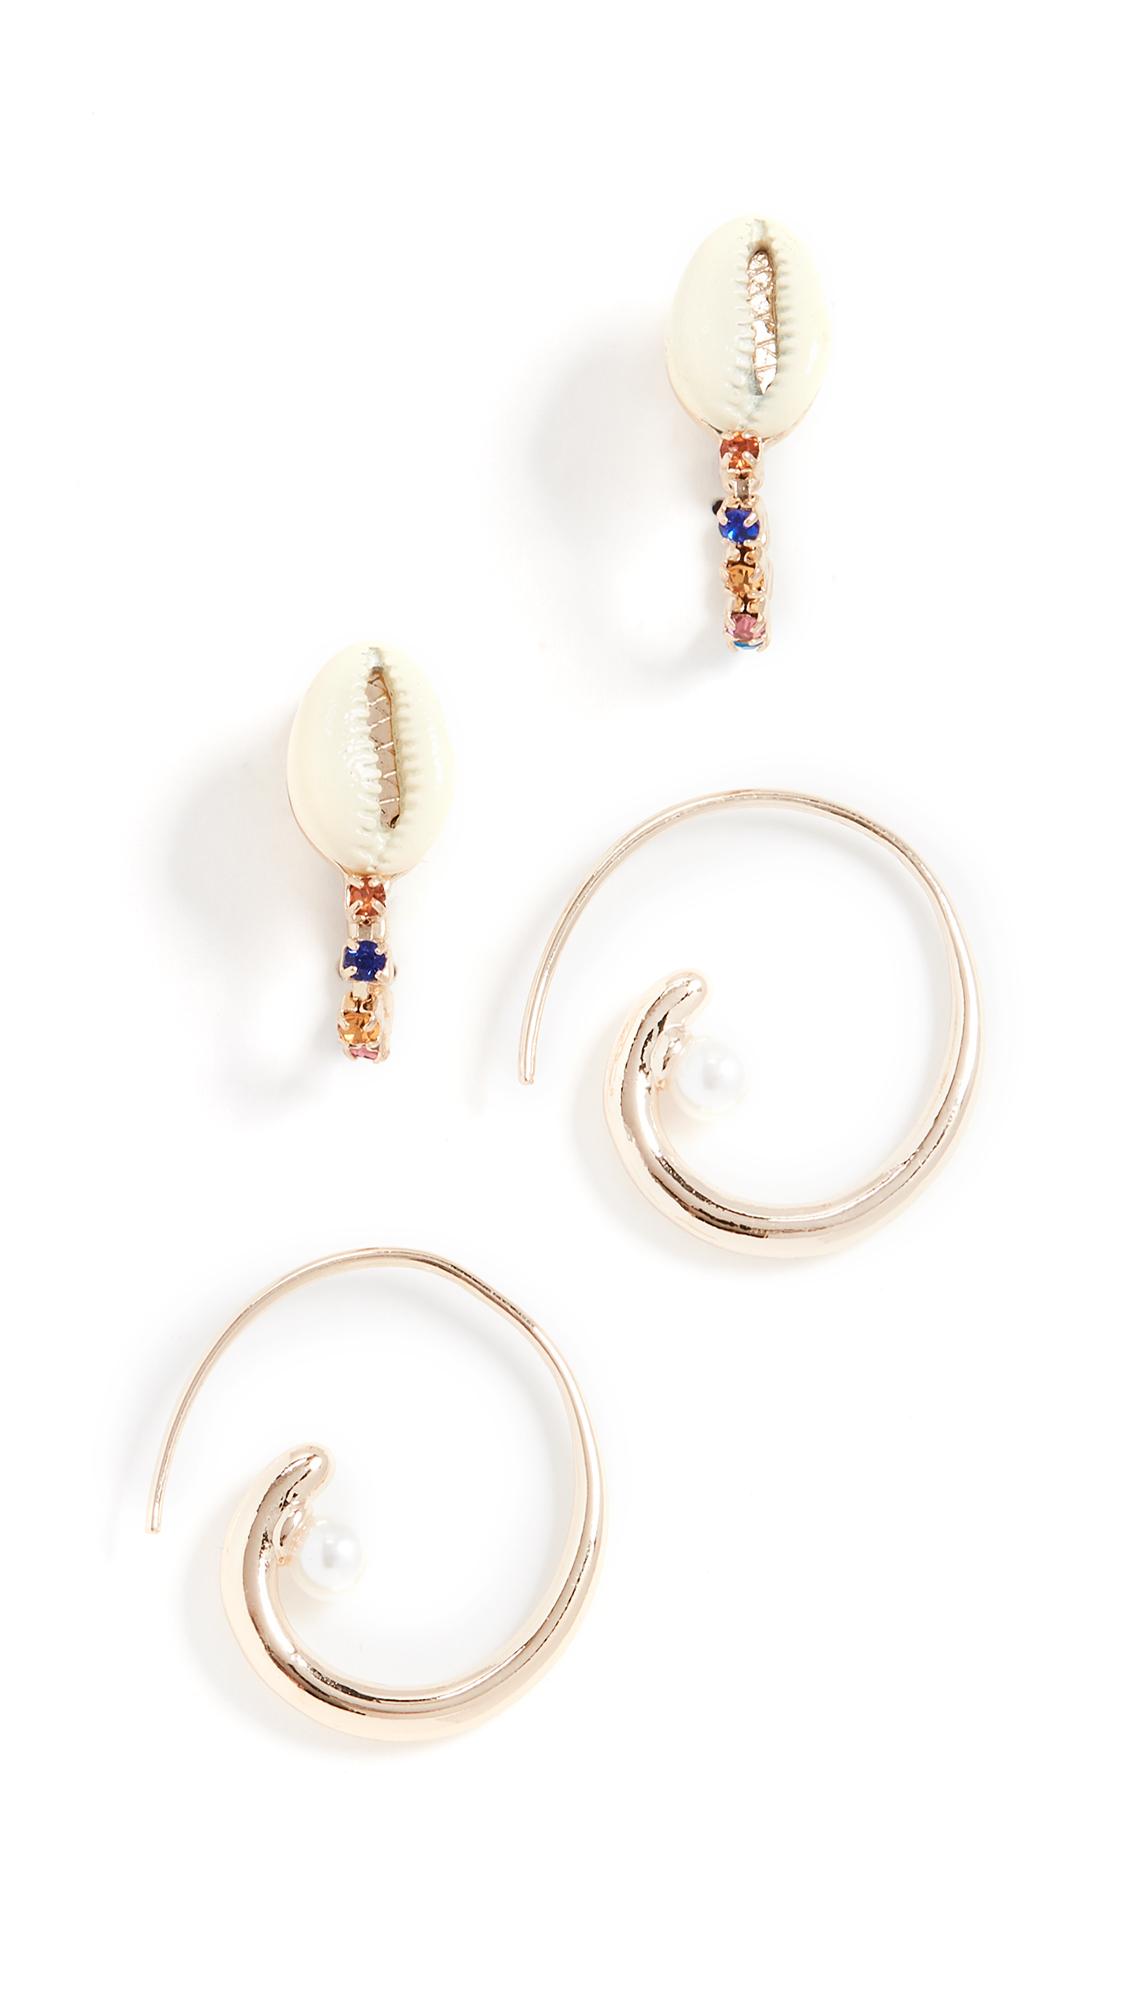 BaubleBar Set of 2 Coral Earrings - Multi/Gold